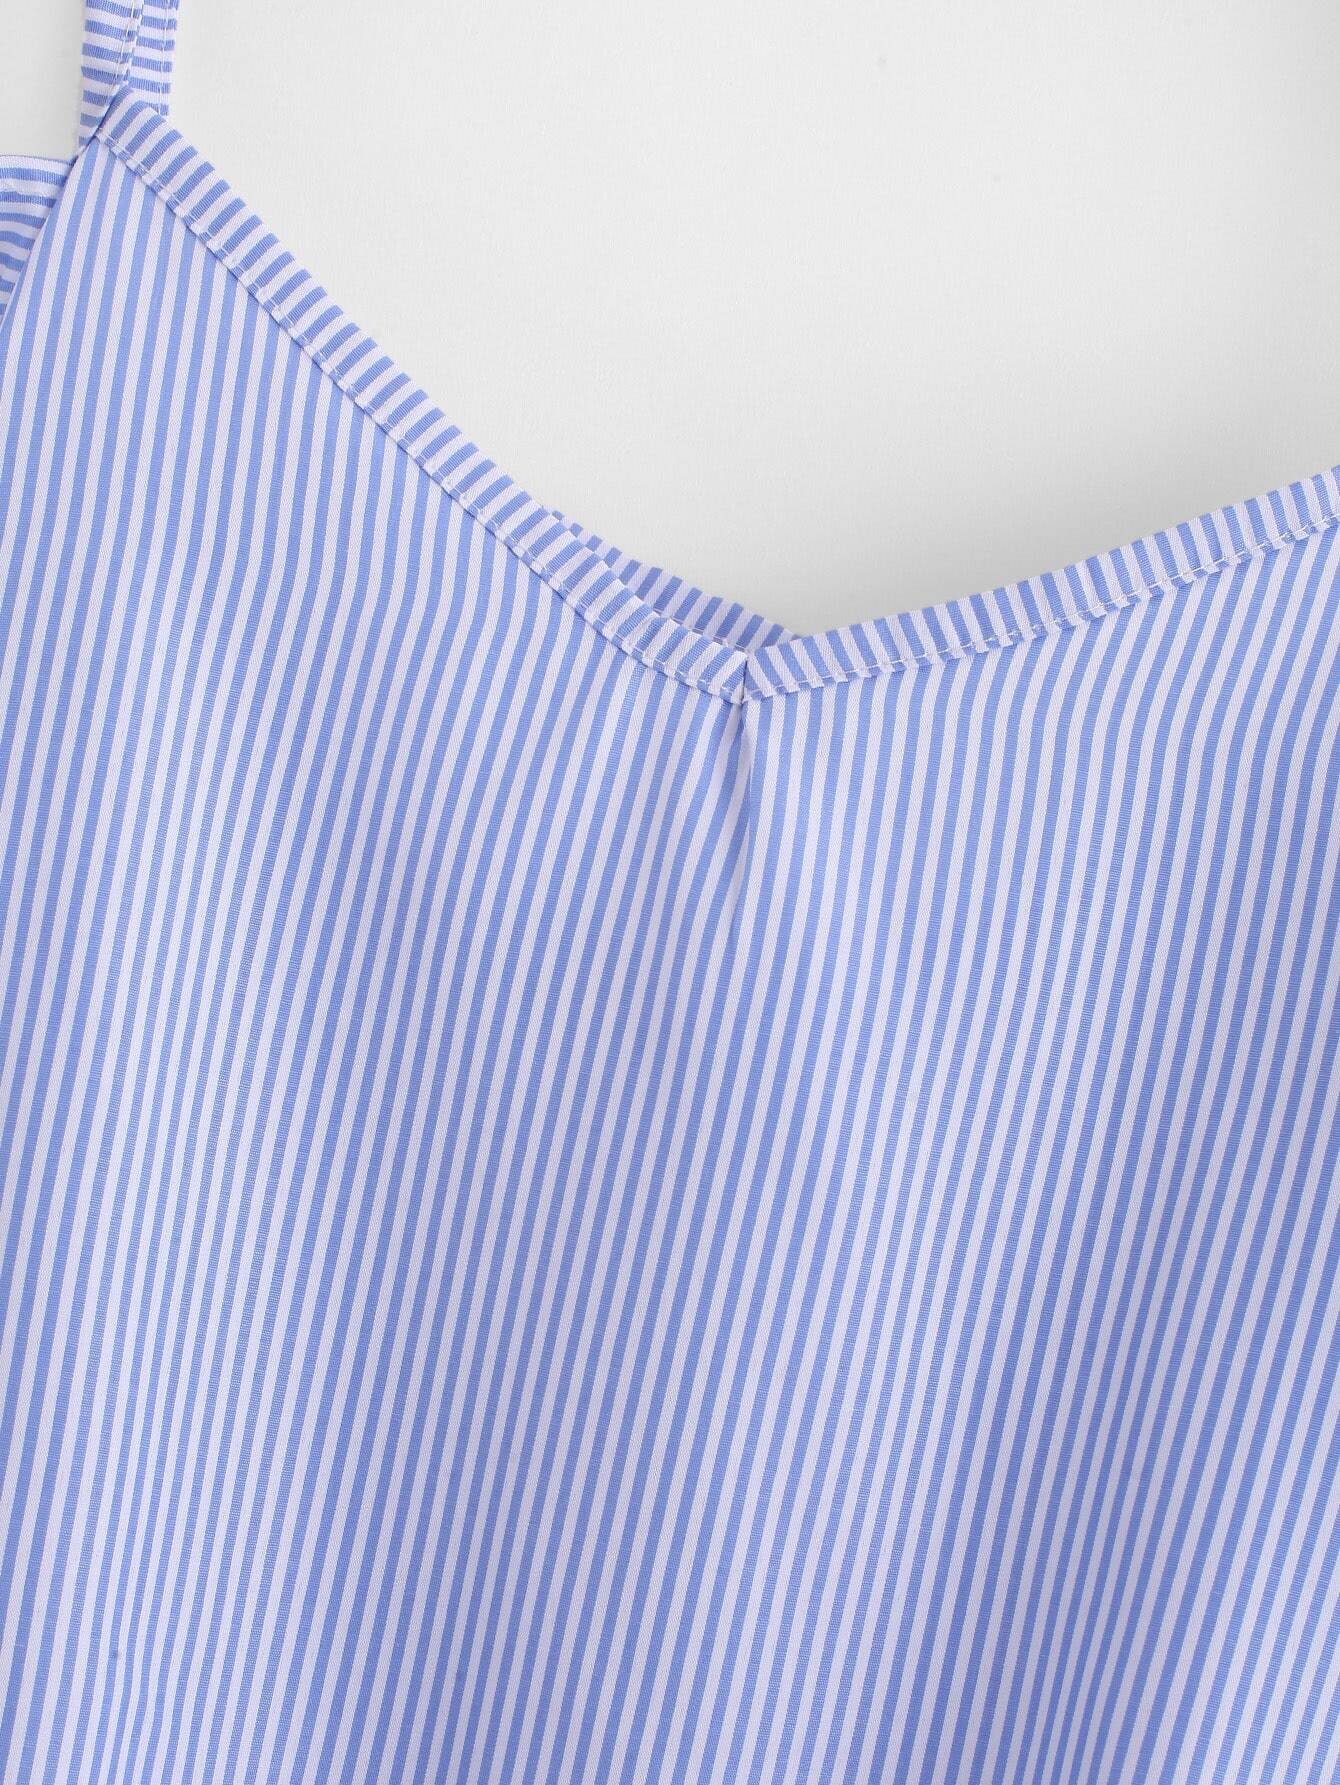 blouse170419103_2